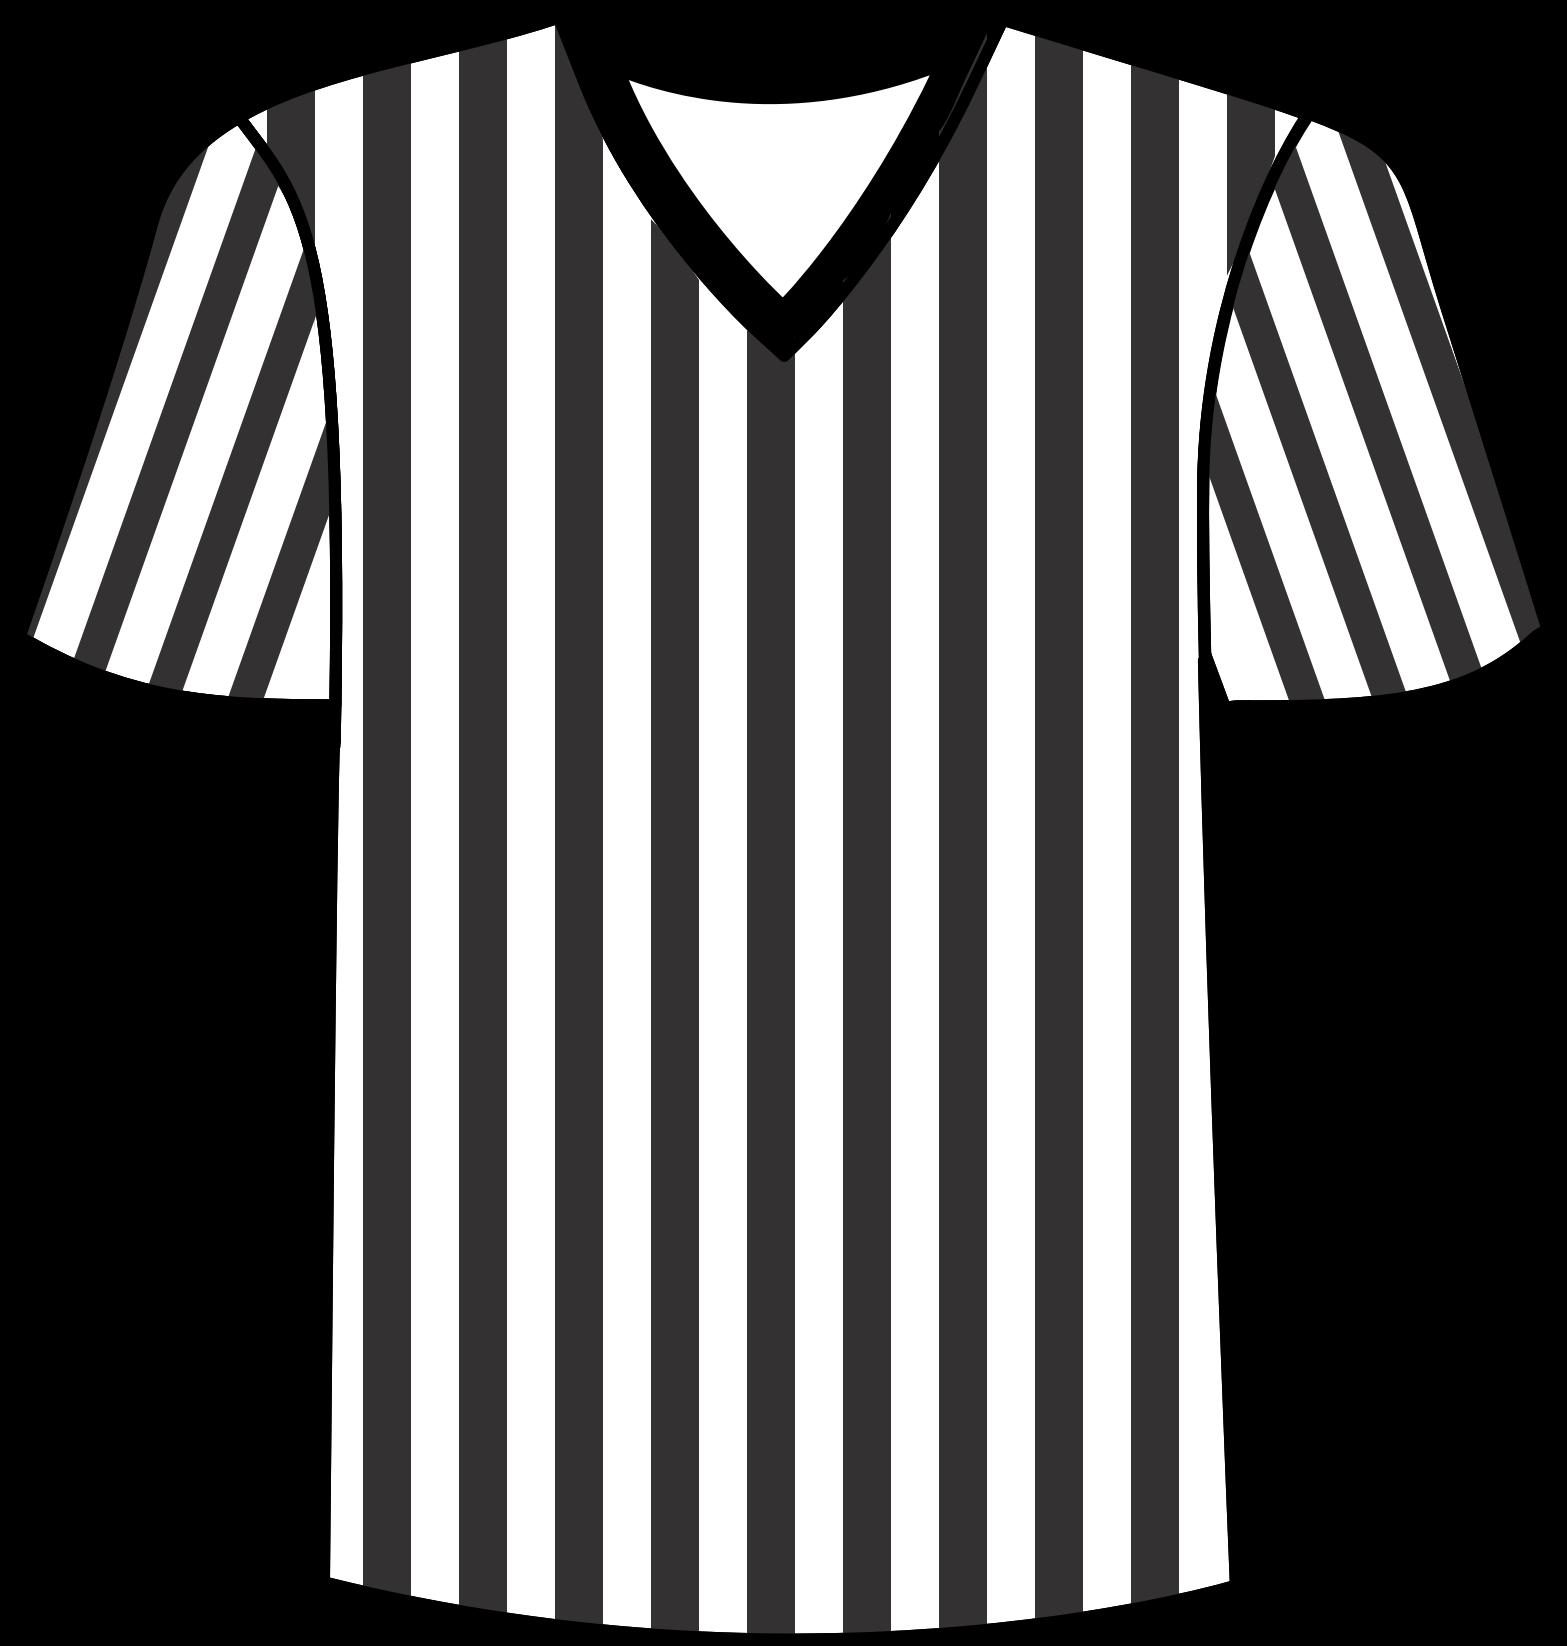 shirts clipart referee